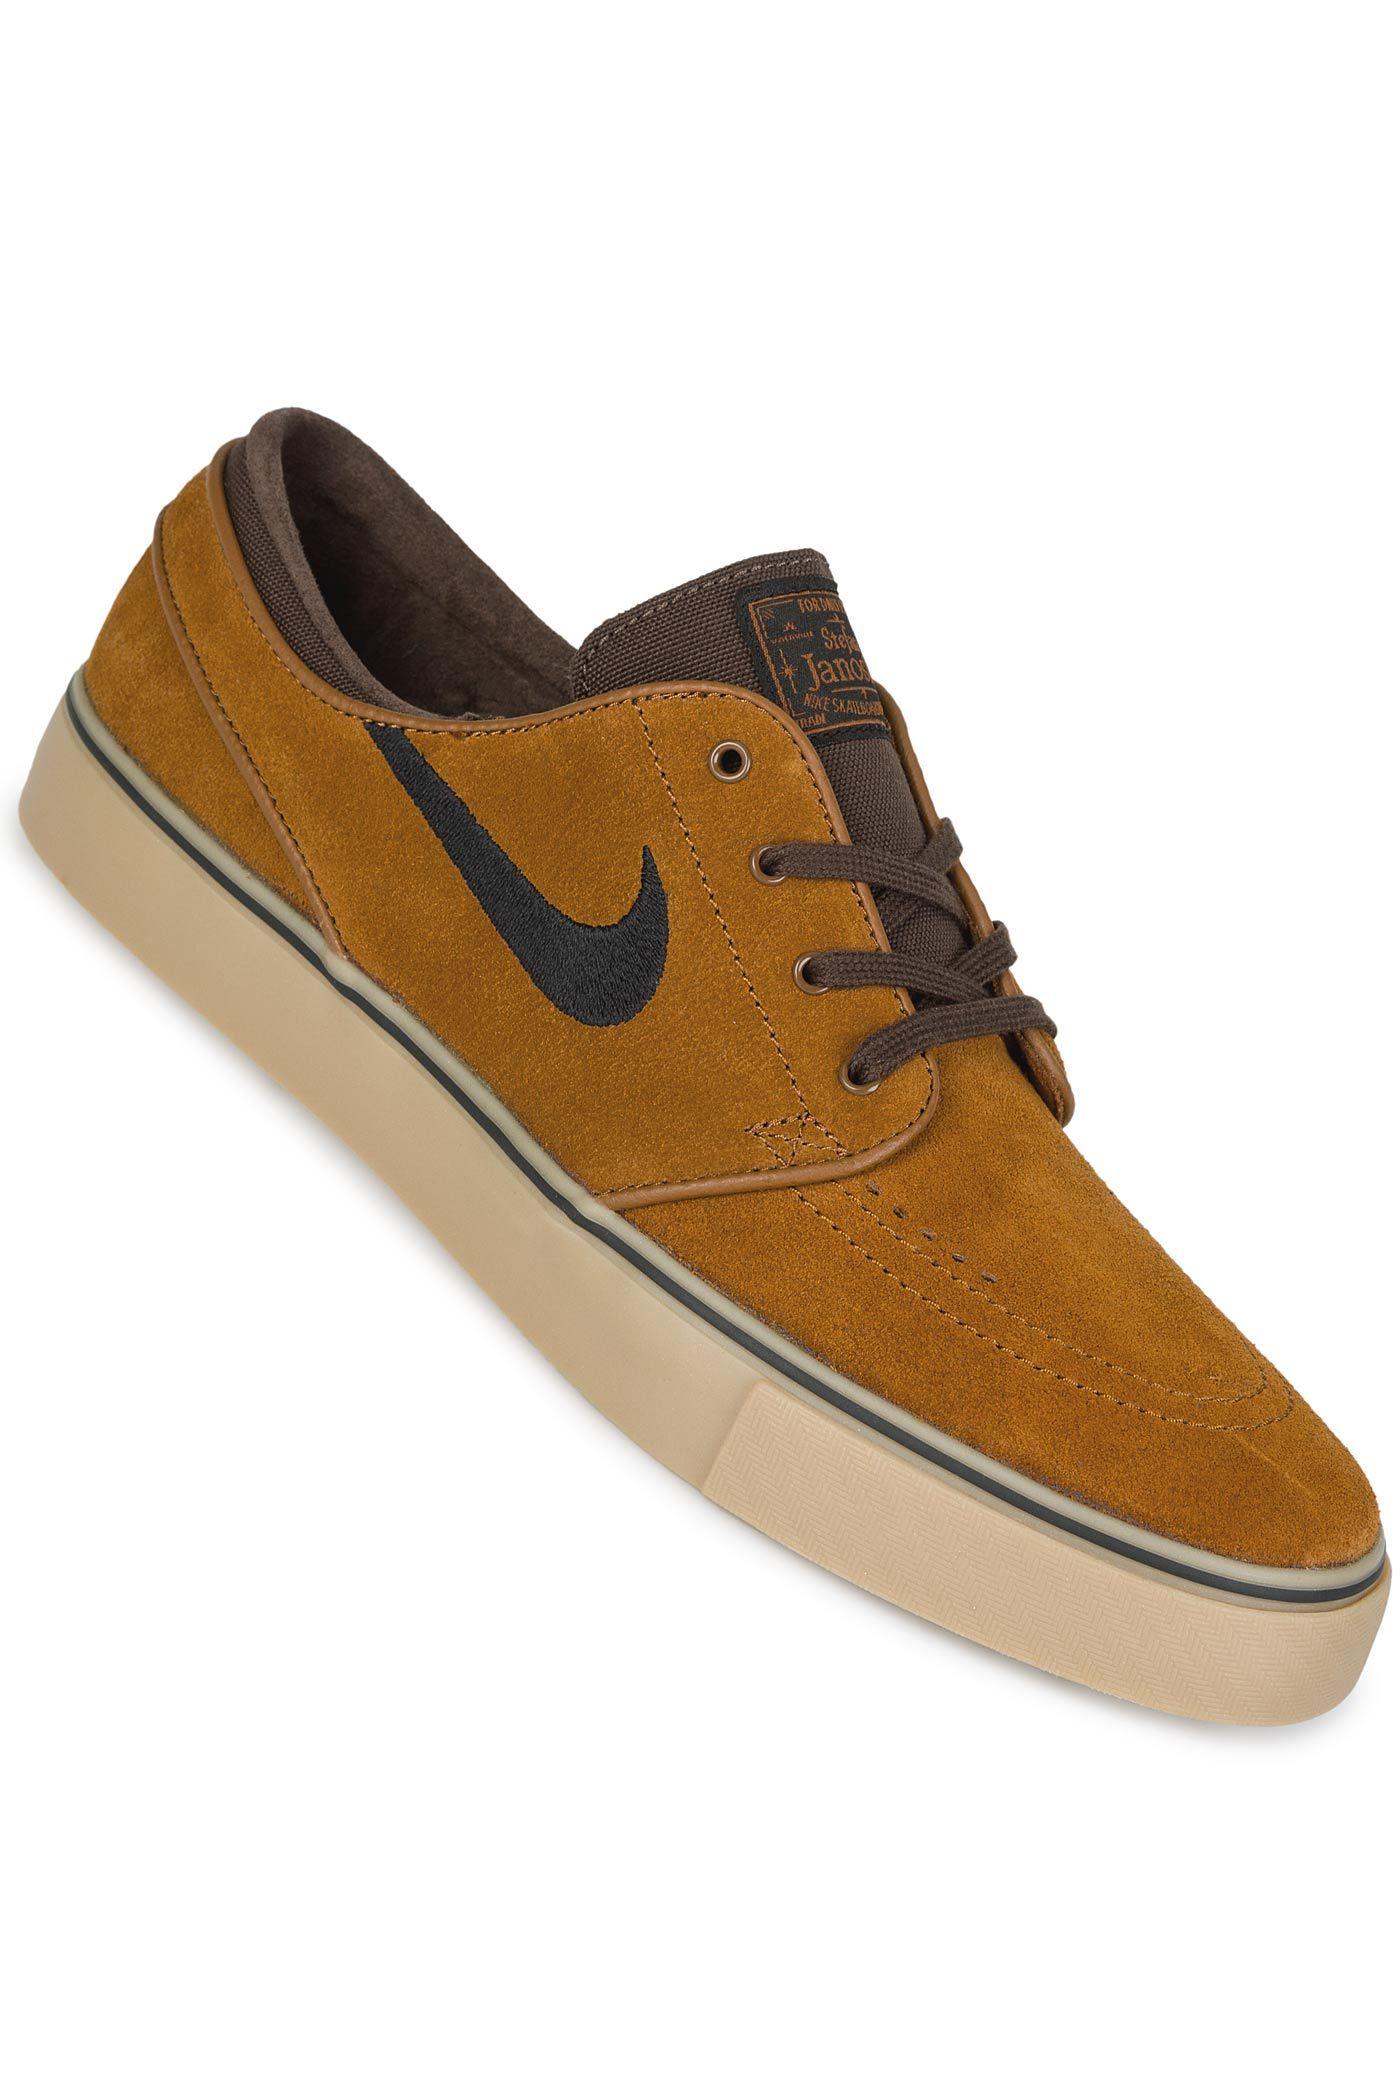 san francisco d2e07 c051c Nike SB Zoom Stefan Janoski Shoe (hazelnut black)